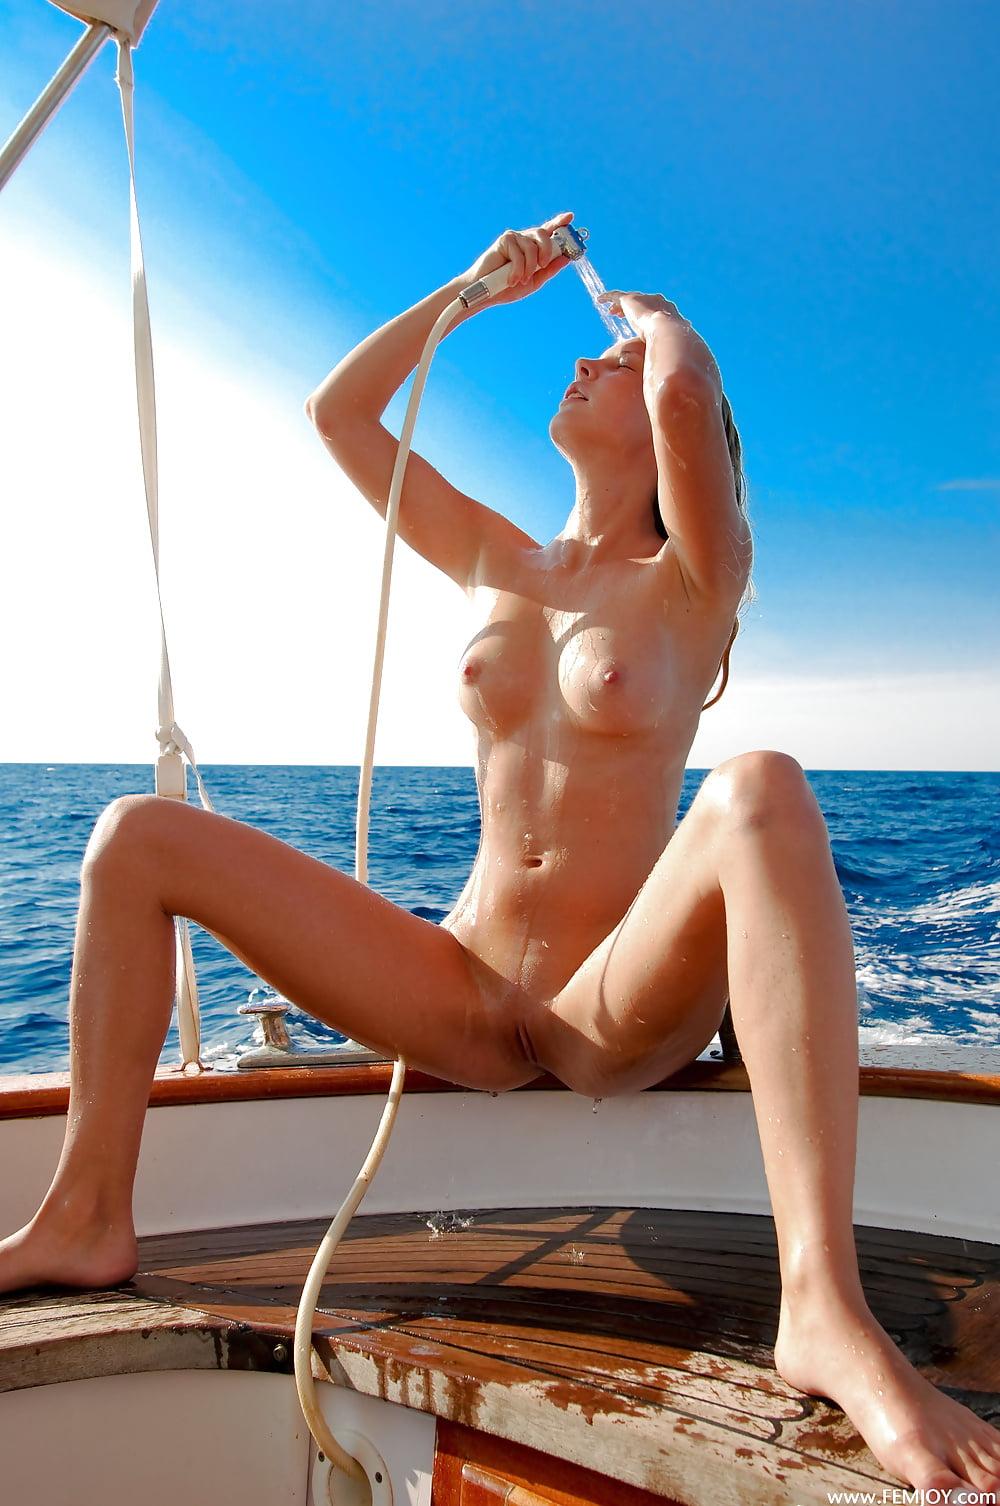 Naked Boating Nude Boat